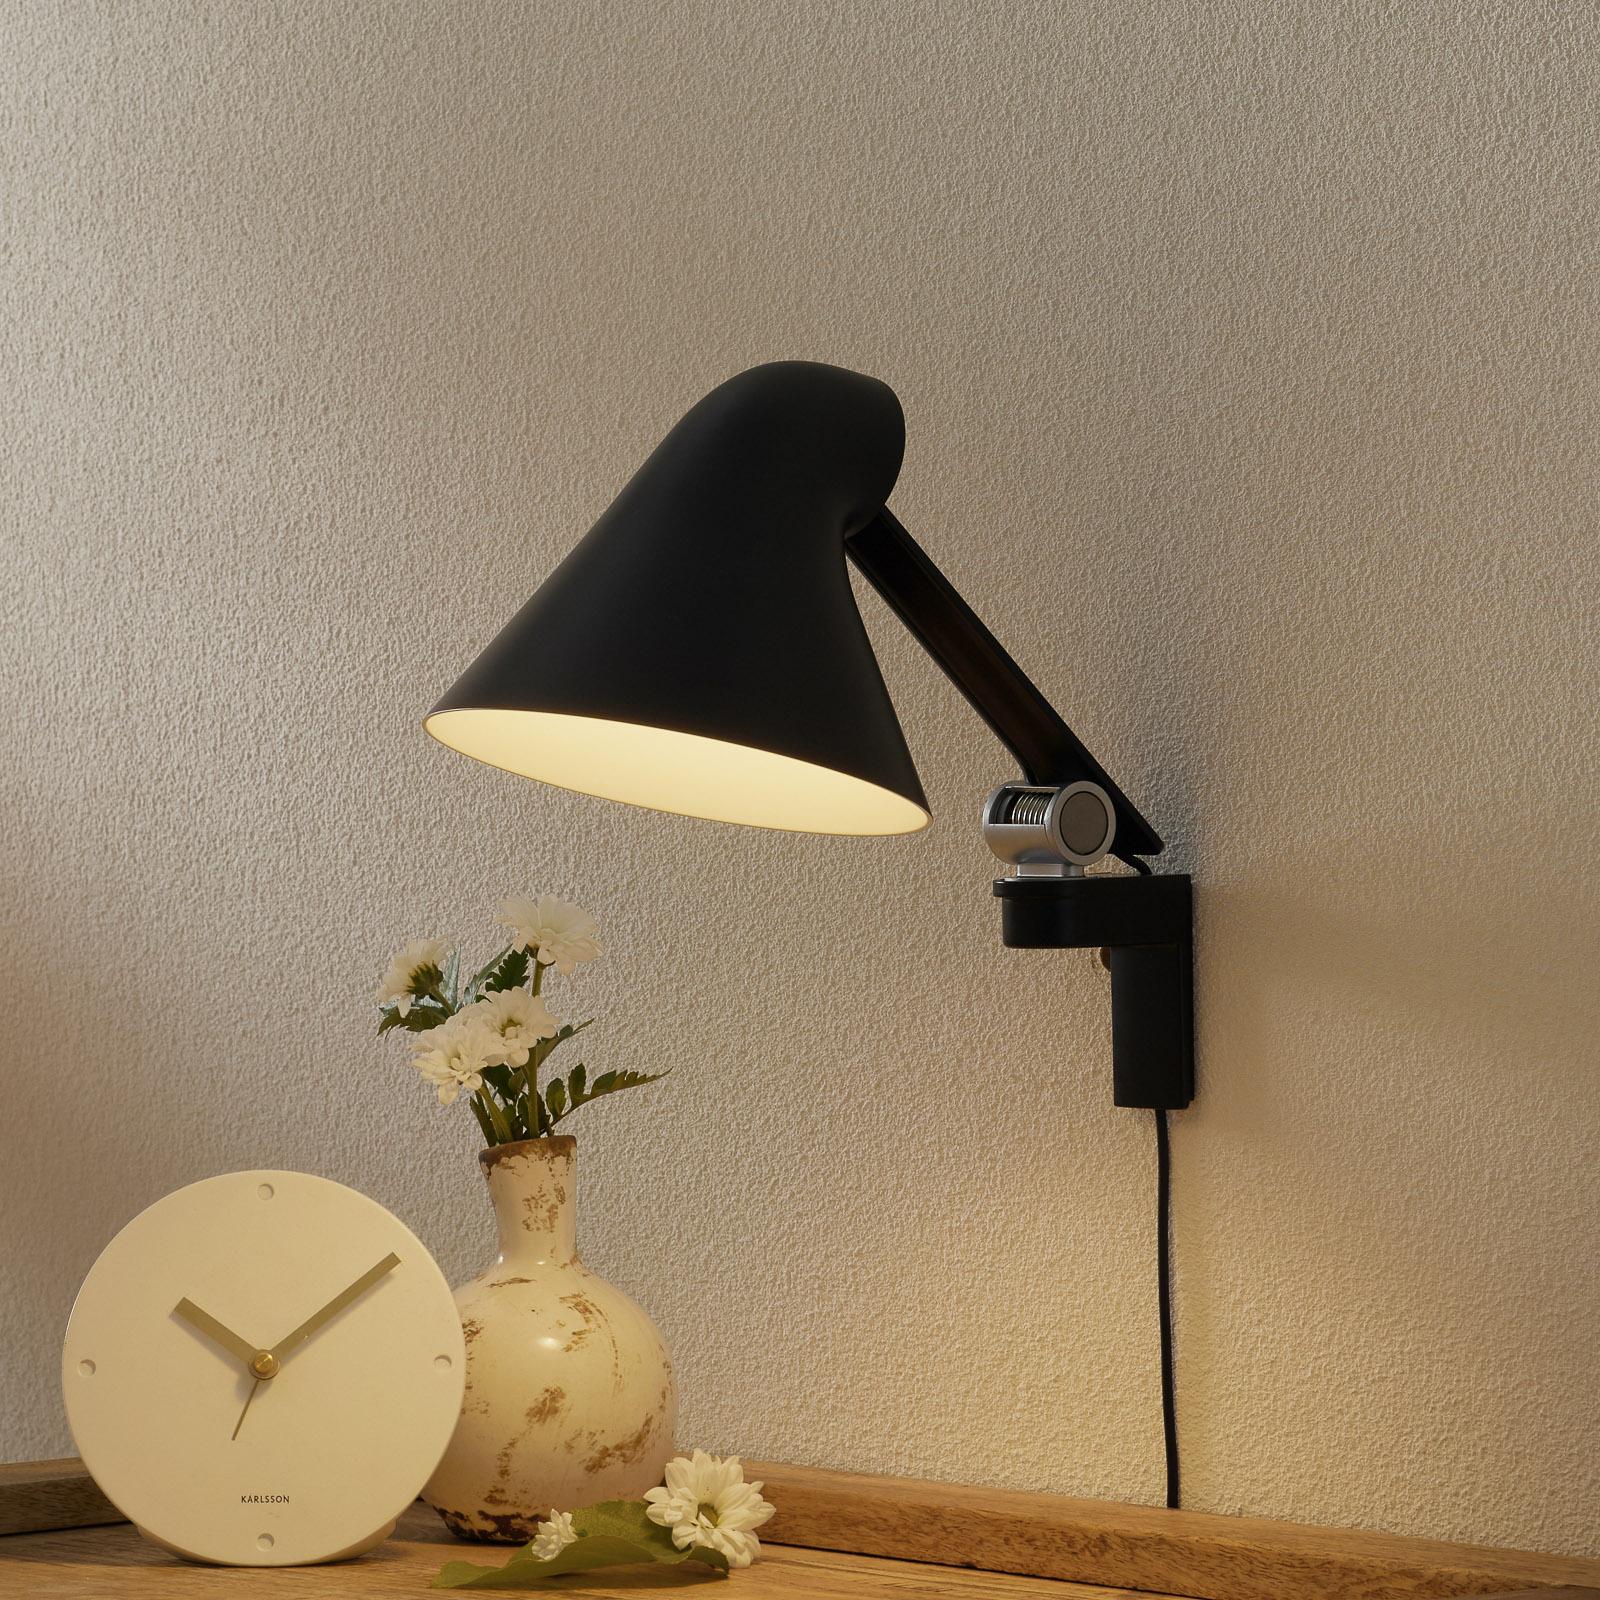 Louis Poulsen NJP LED wandlamp arm kort, zwart